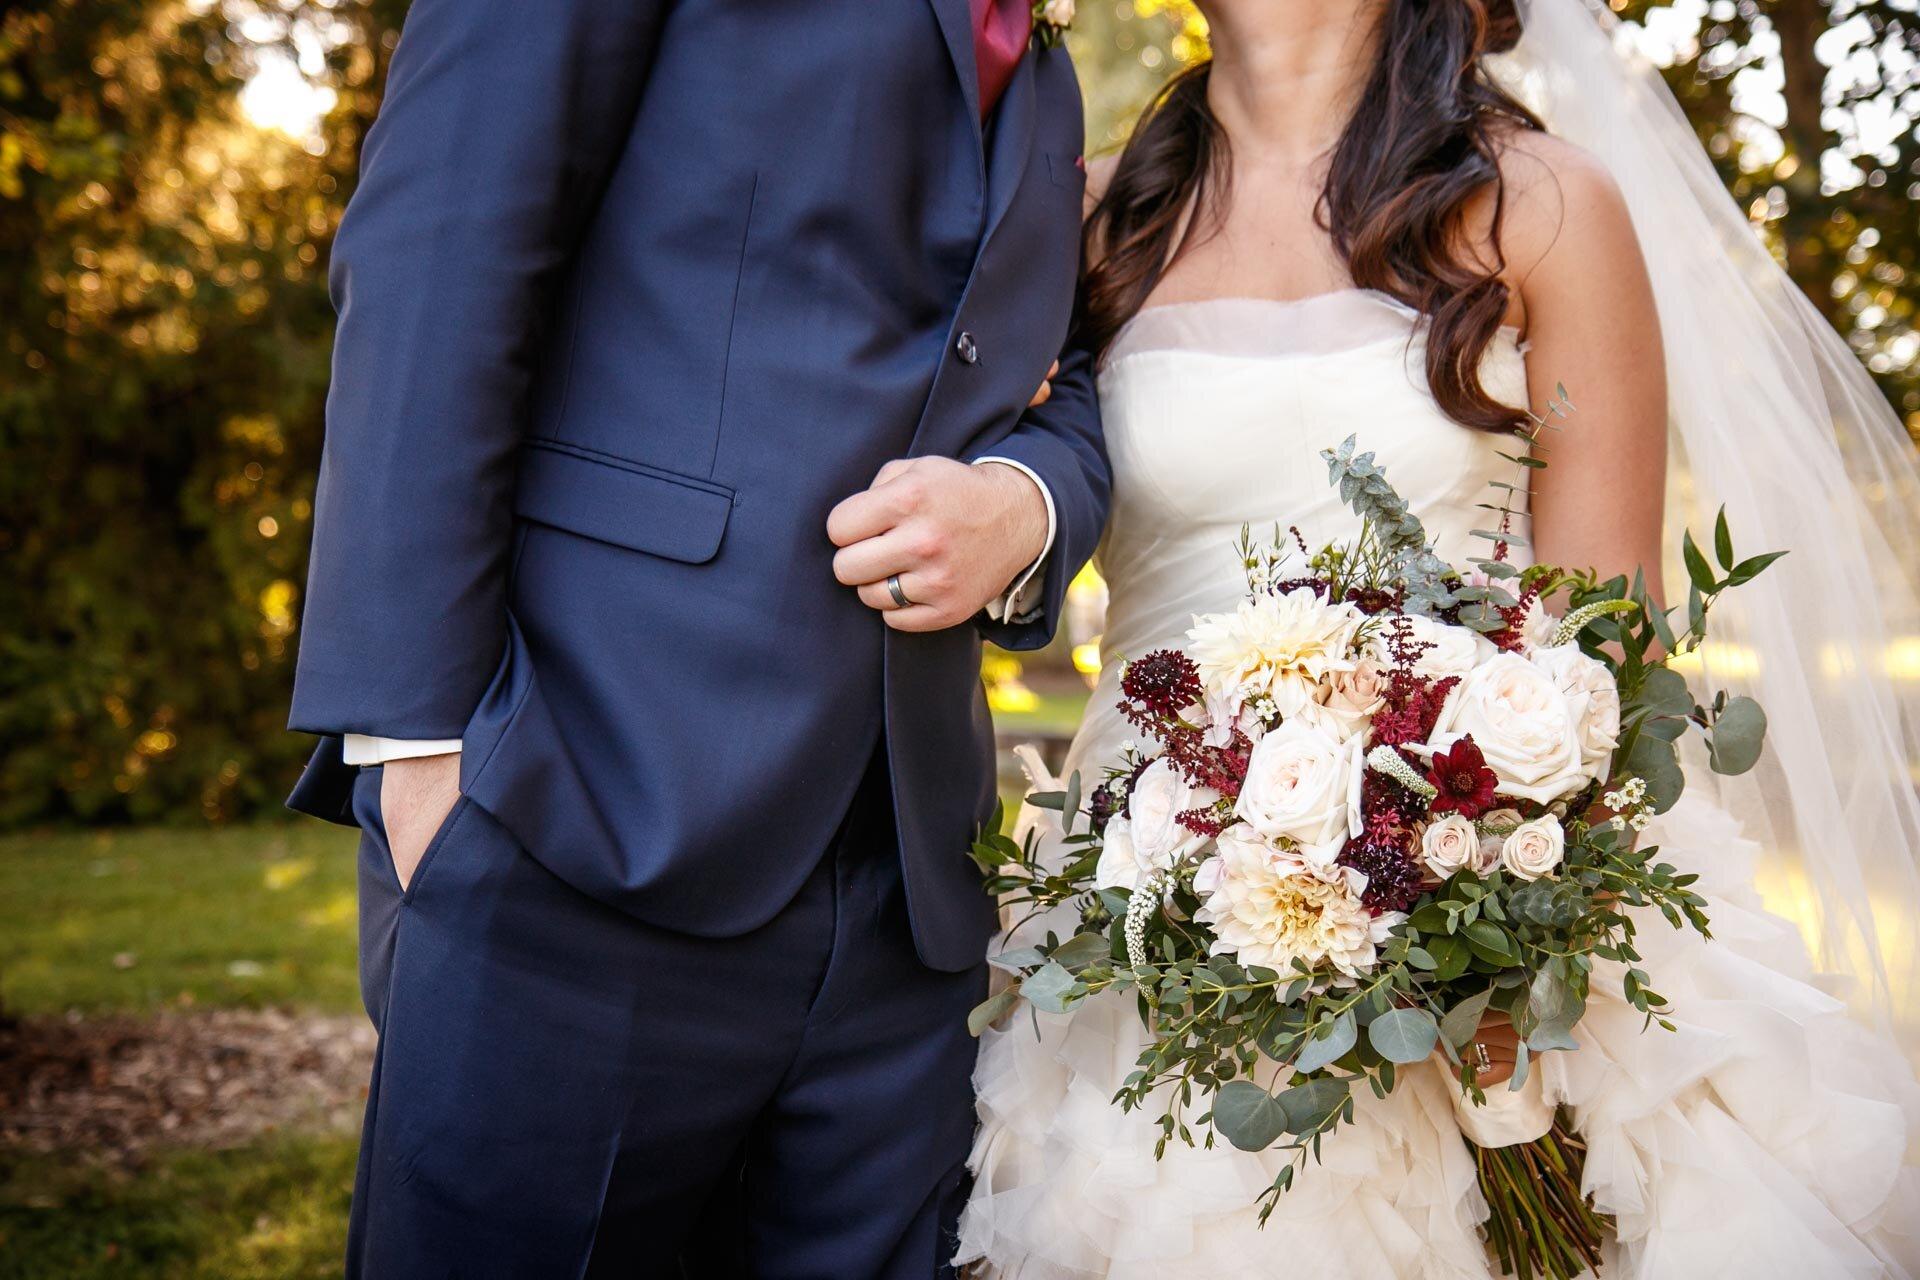 fall-lighting-adam-shea-photography-wedding-engagement-blog-adam-shea-photography-green-bay-appleton-neenah-photographer-18.jpg